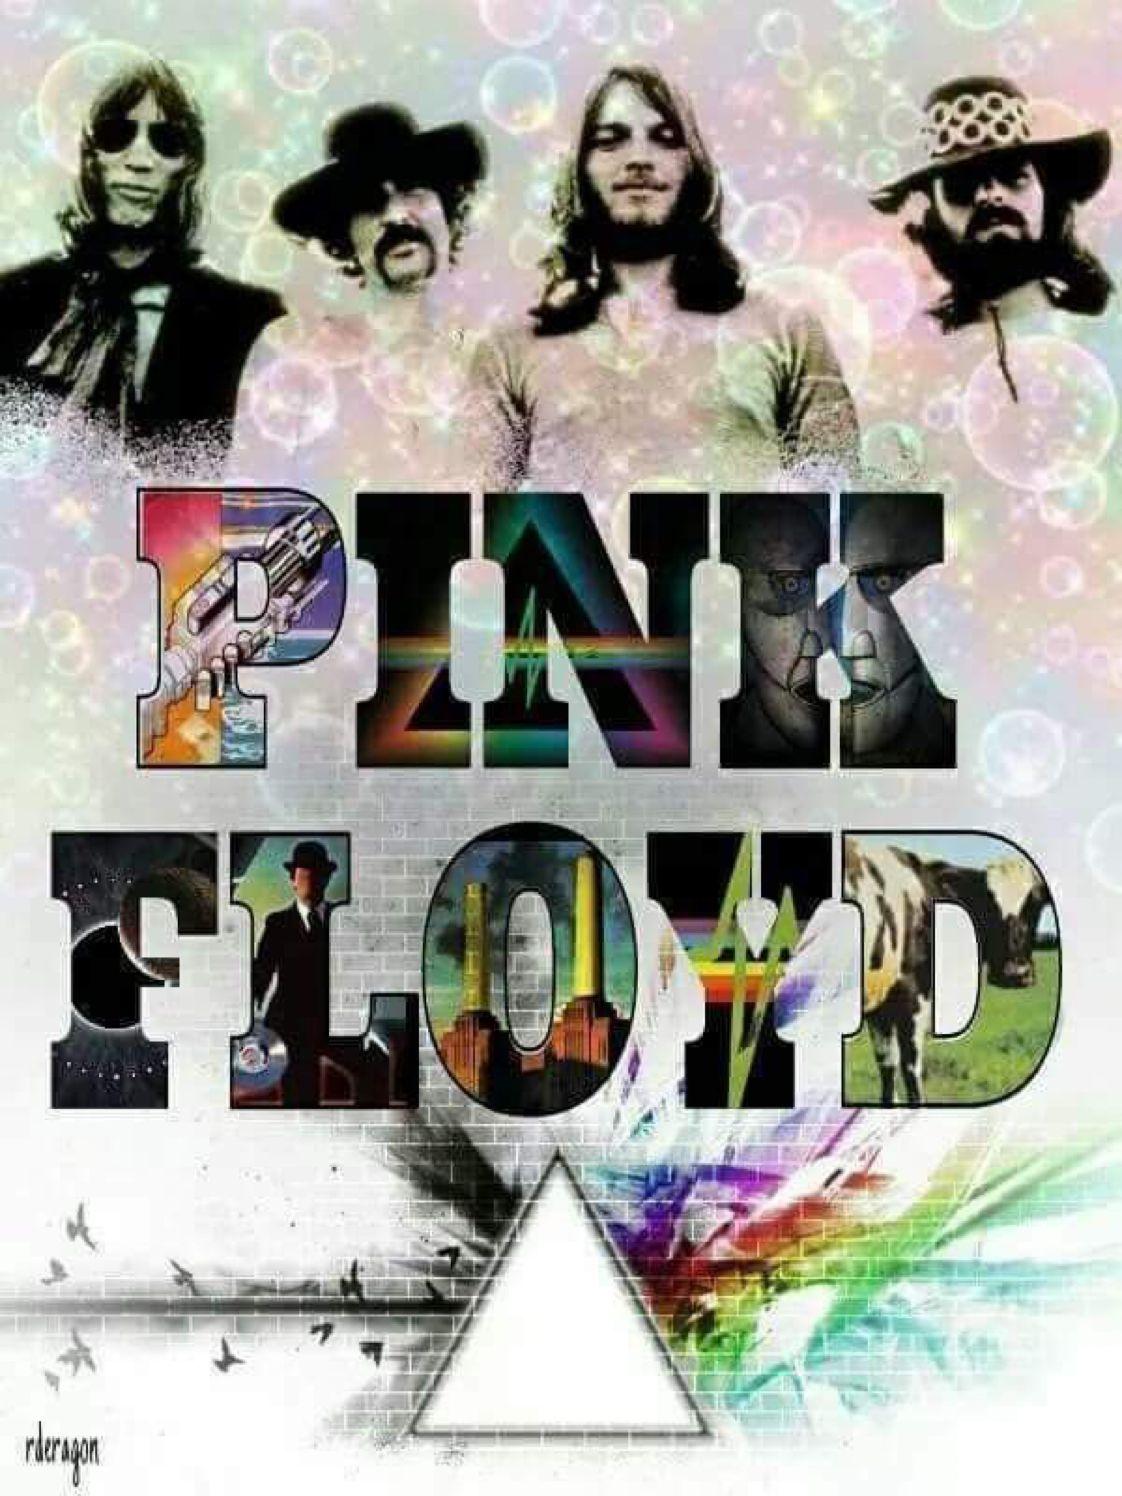 Pink floyd image by Maishatasnim Pink floyd art, Pink